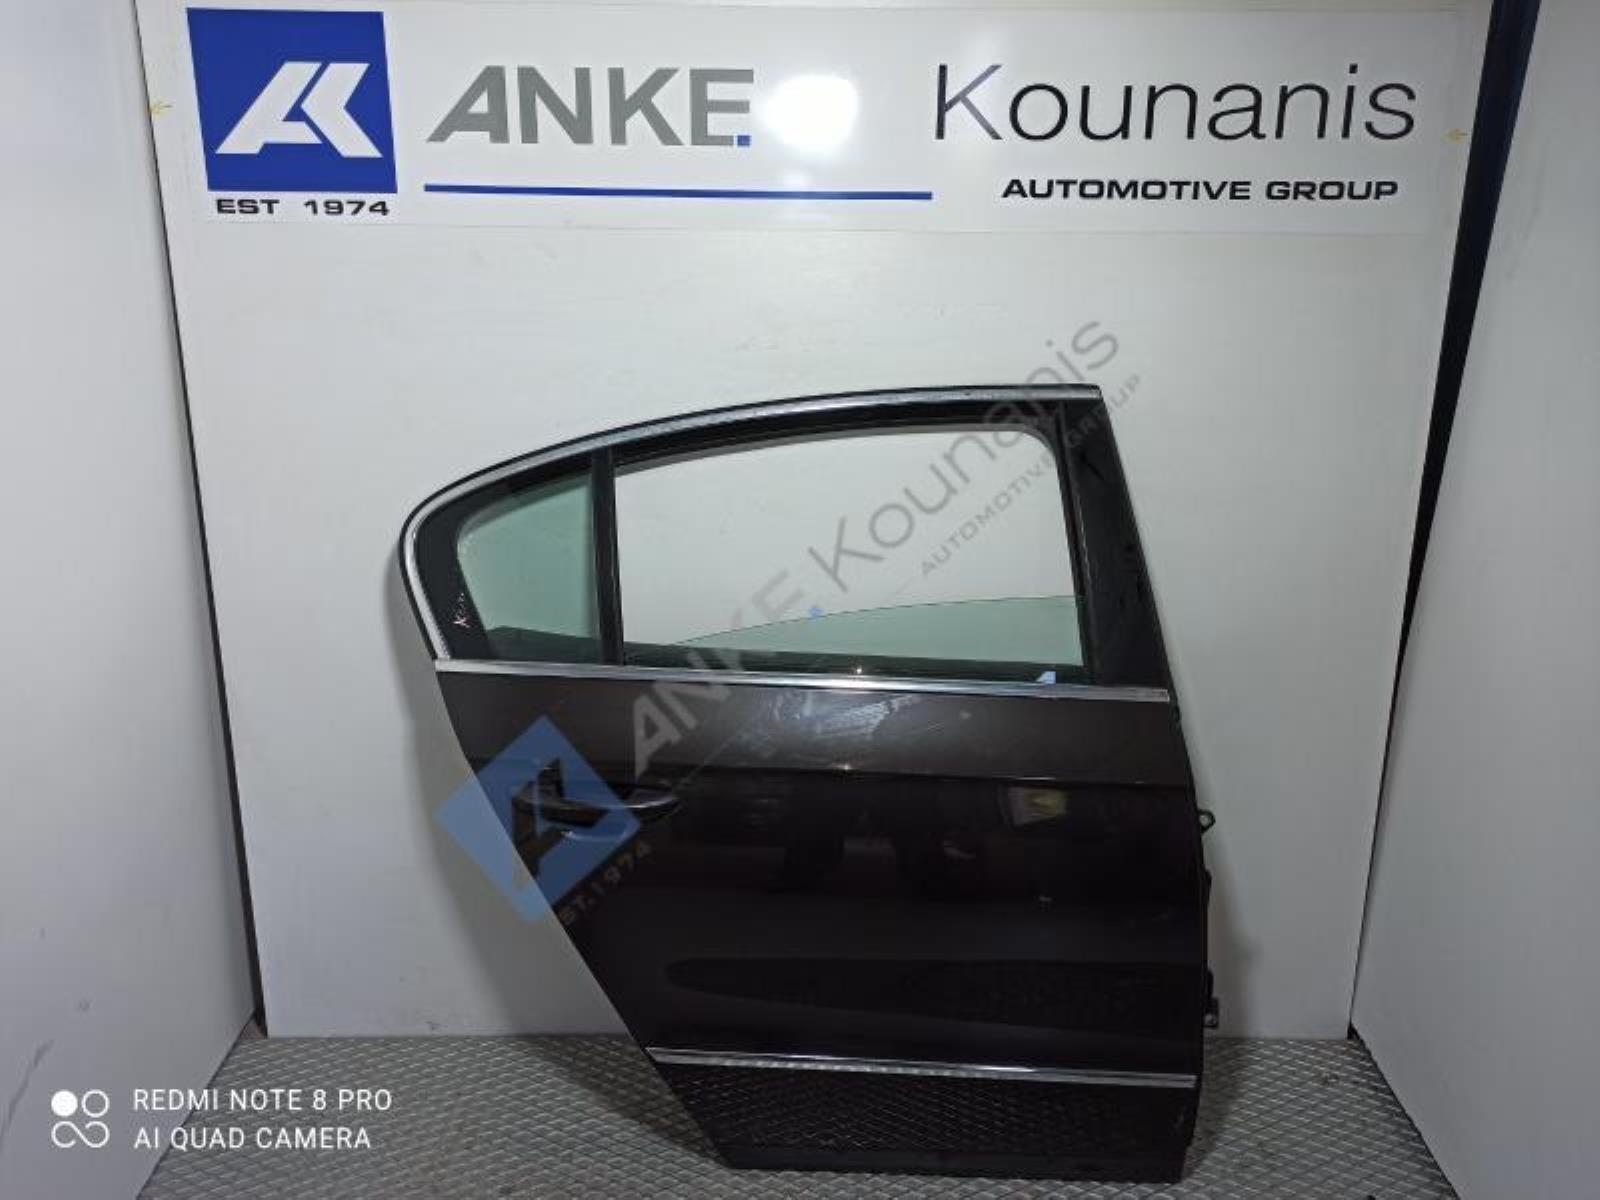 Picture of ΠΟΡΤΑ ΠΙΣΩ ΔΕΞΙΑ ΑΝΘΡΑΚΙ SEDAN